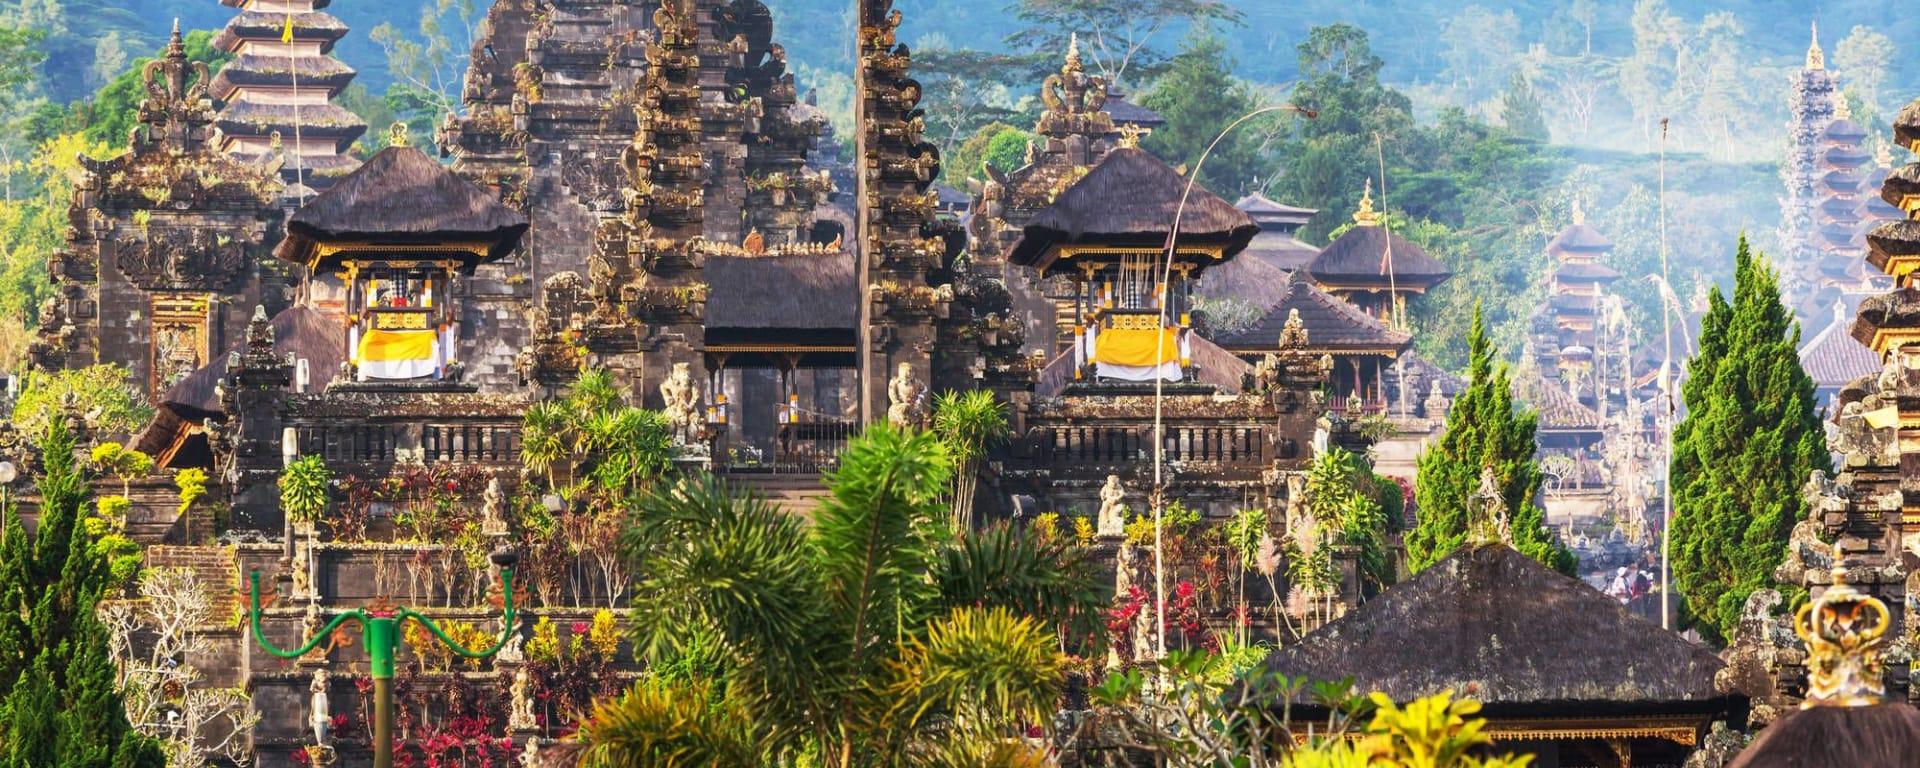 Ausflugtransfer Nordbali - Ubud: Bali Pura Besakih Temple